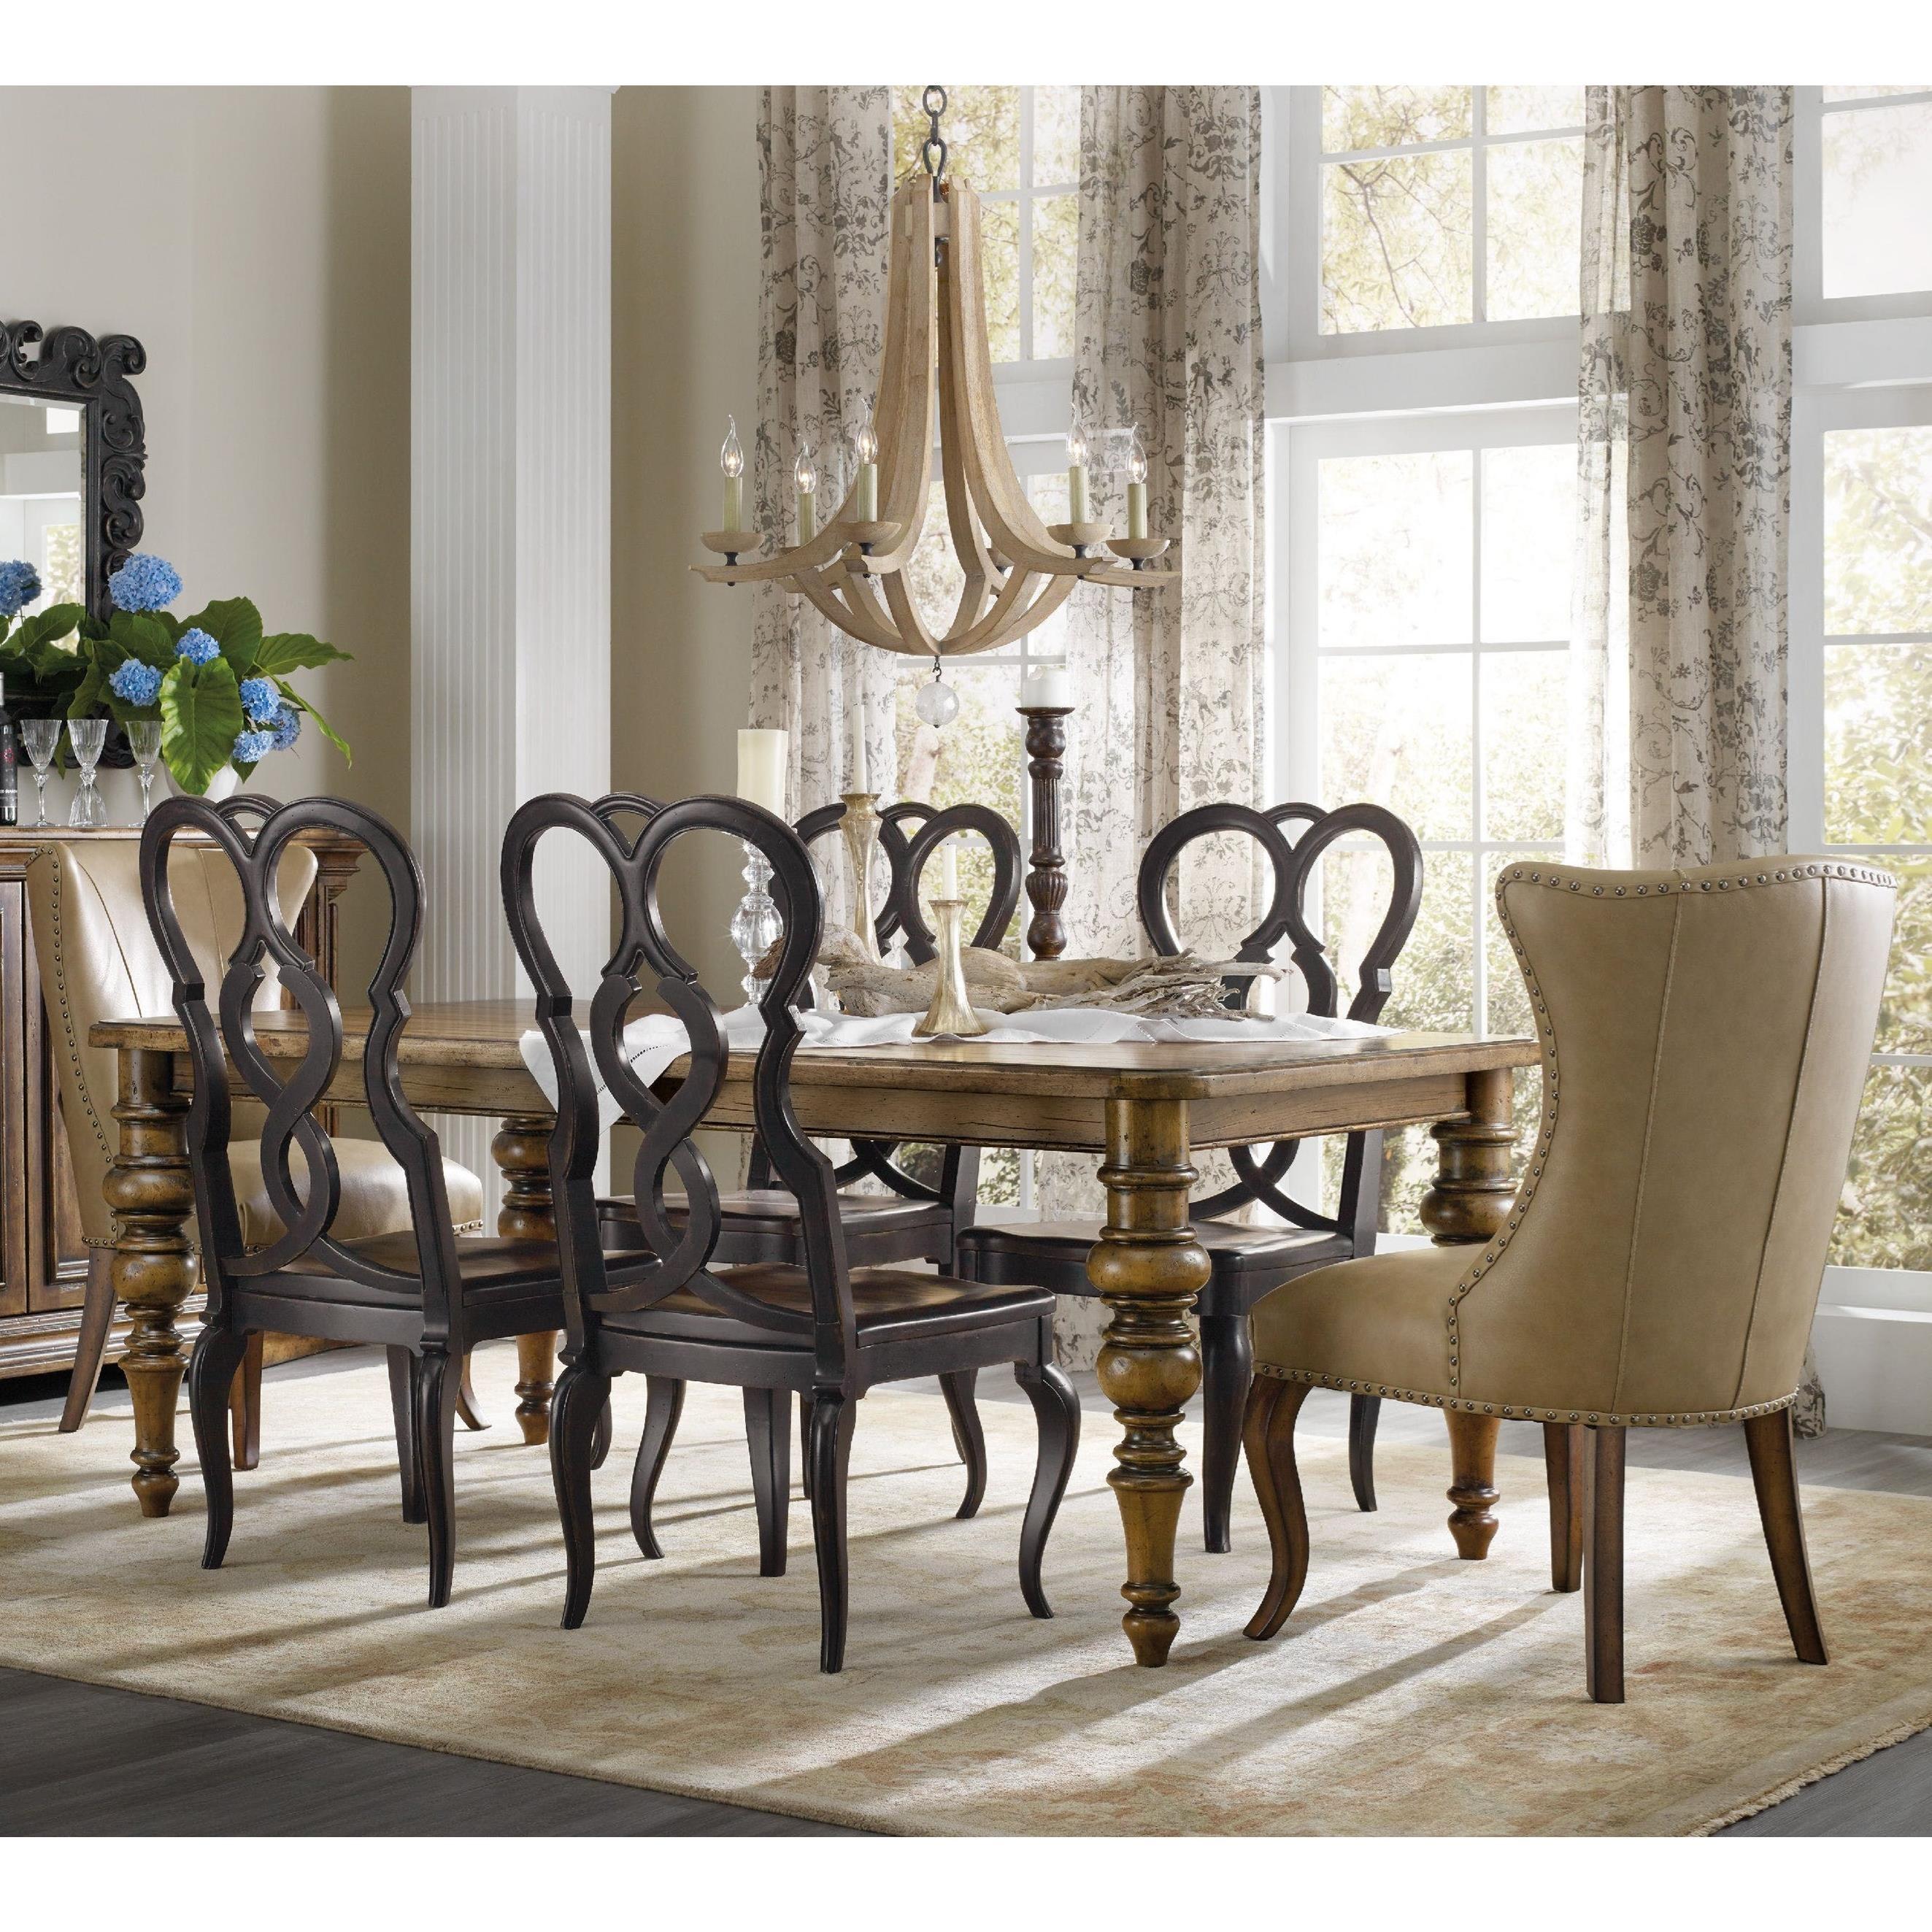 Hooker Furniture Auberose 7 Piece Dining Set - Item Number: 1595-75200A+2x350142+4x75310-LTBK